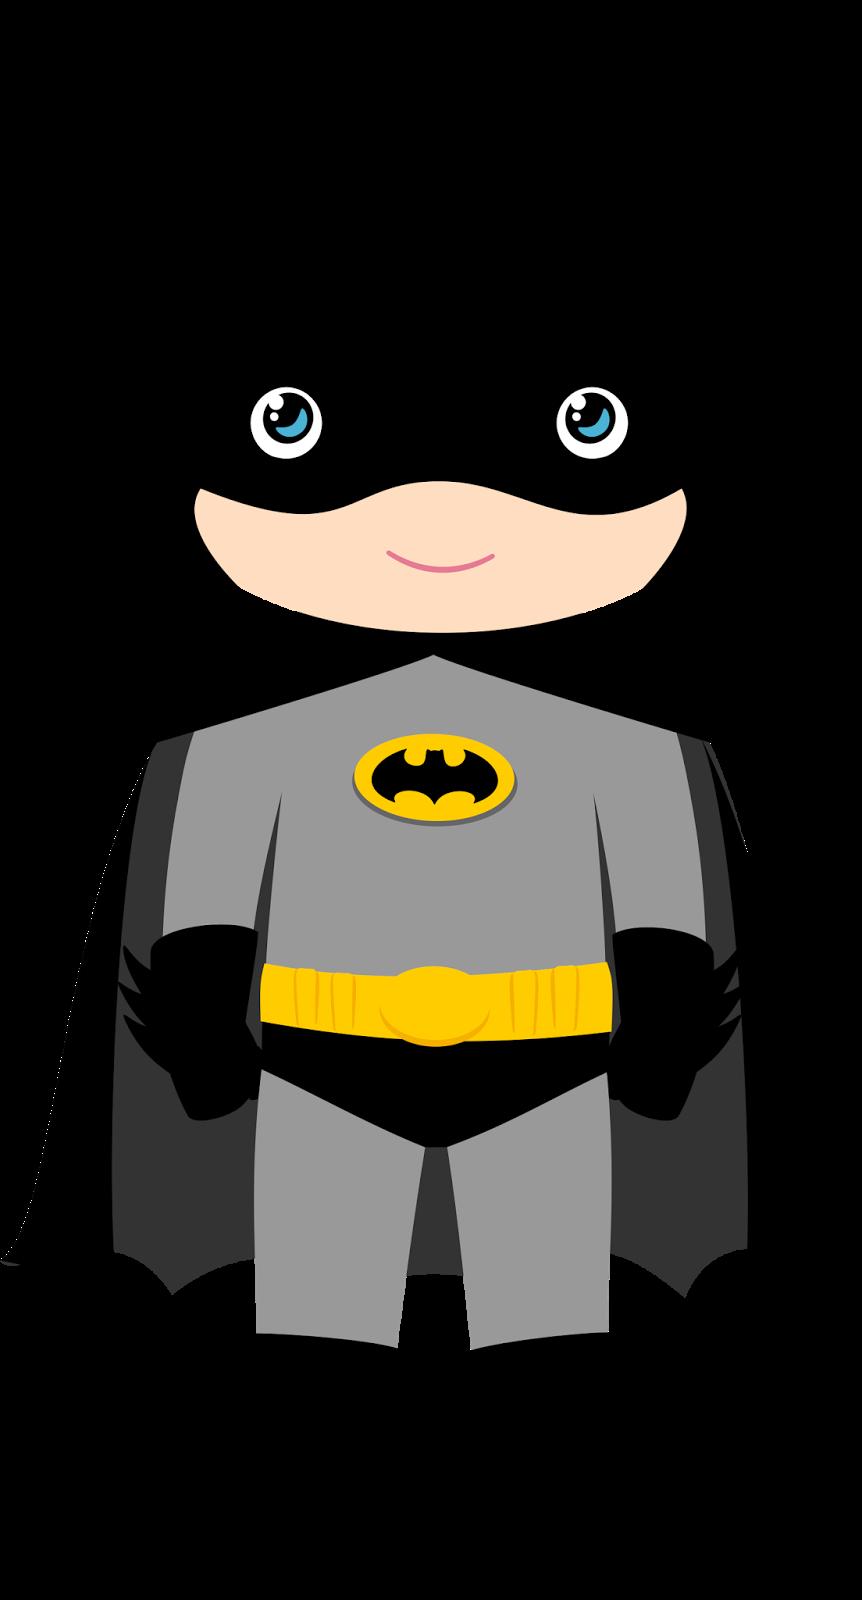 Halloween superheroes clipart picture black and white stock Gifs y Fondos PazenlaTormenta: IMÁGENES DE BATMAN PARA NIÑOS ... picture black and white stock